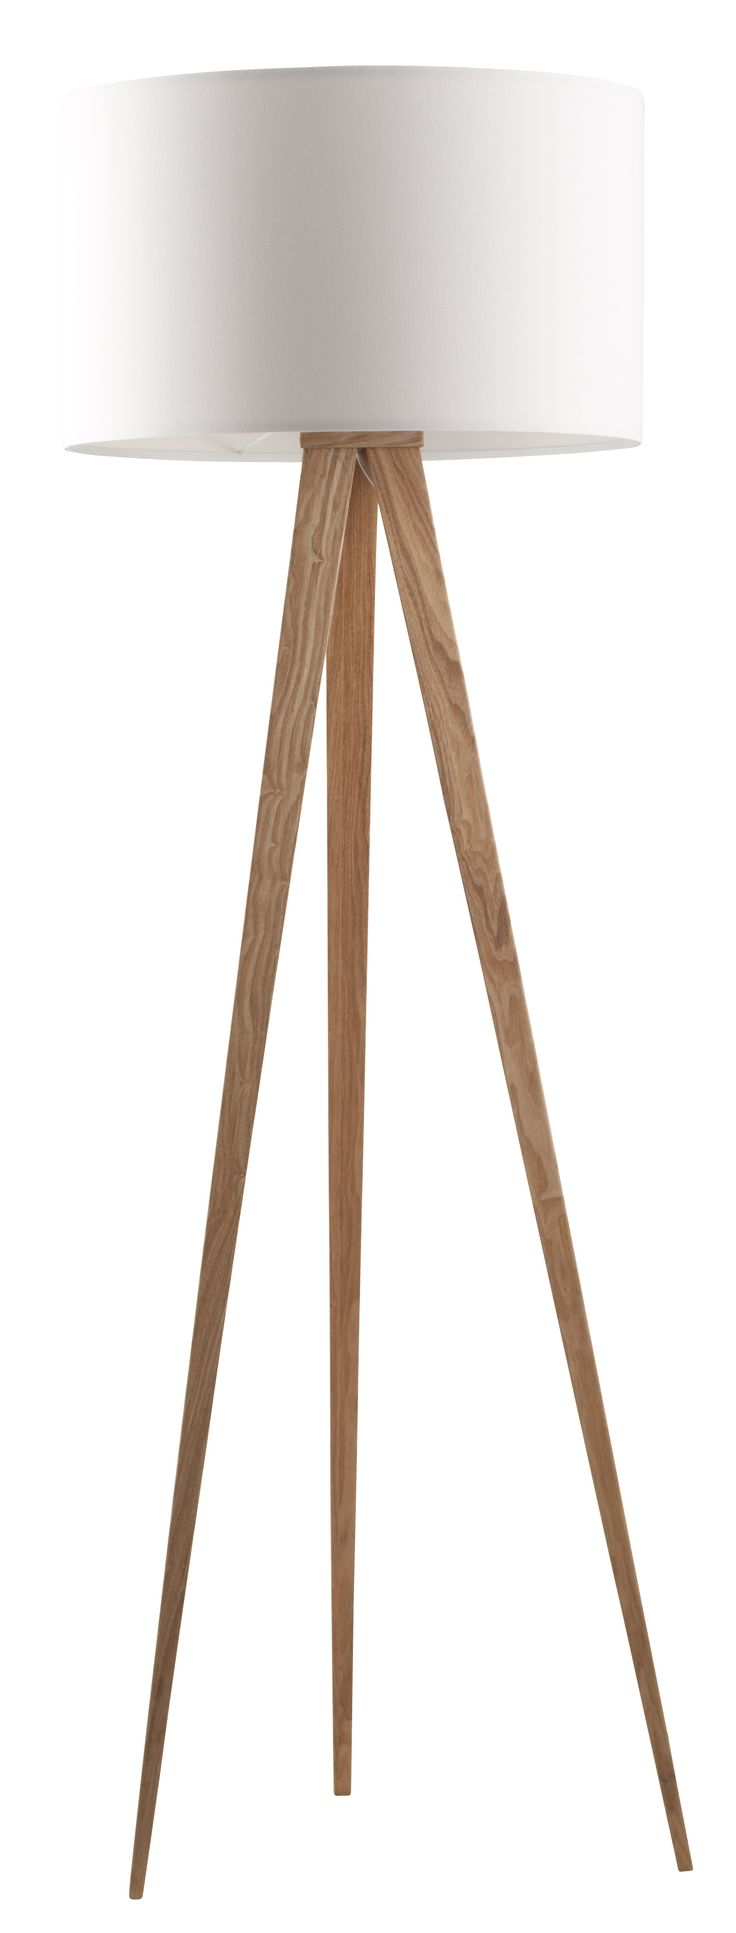 Tripod wood floor lamp of Zuiver